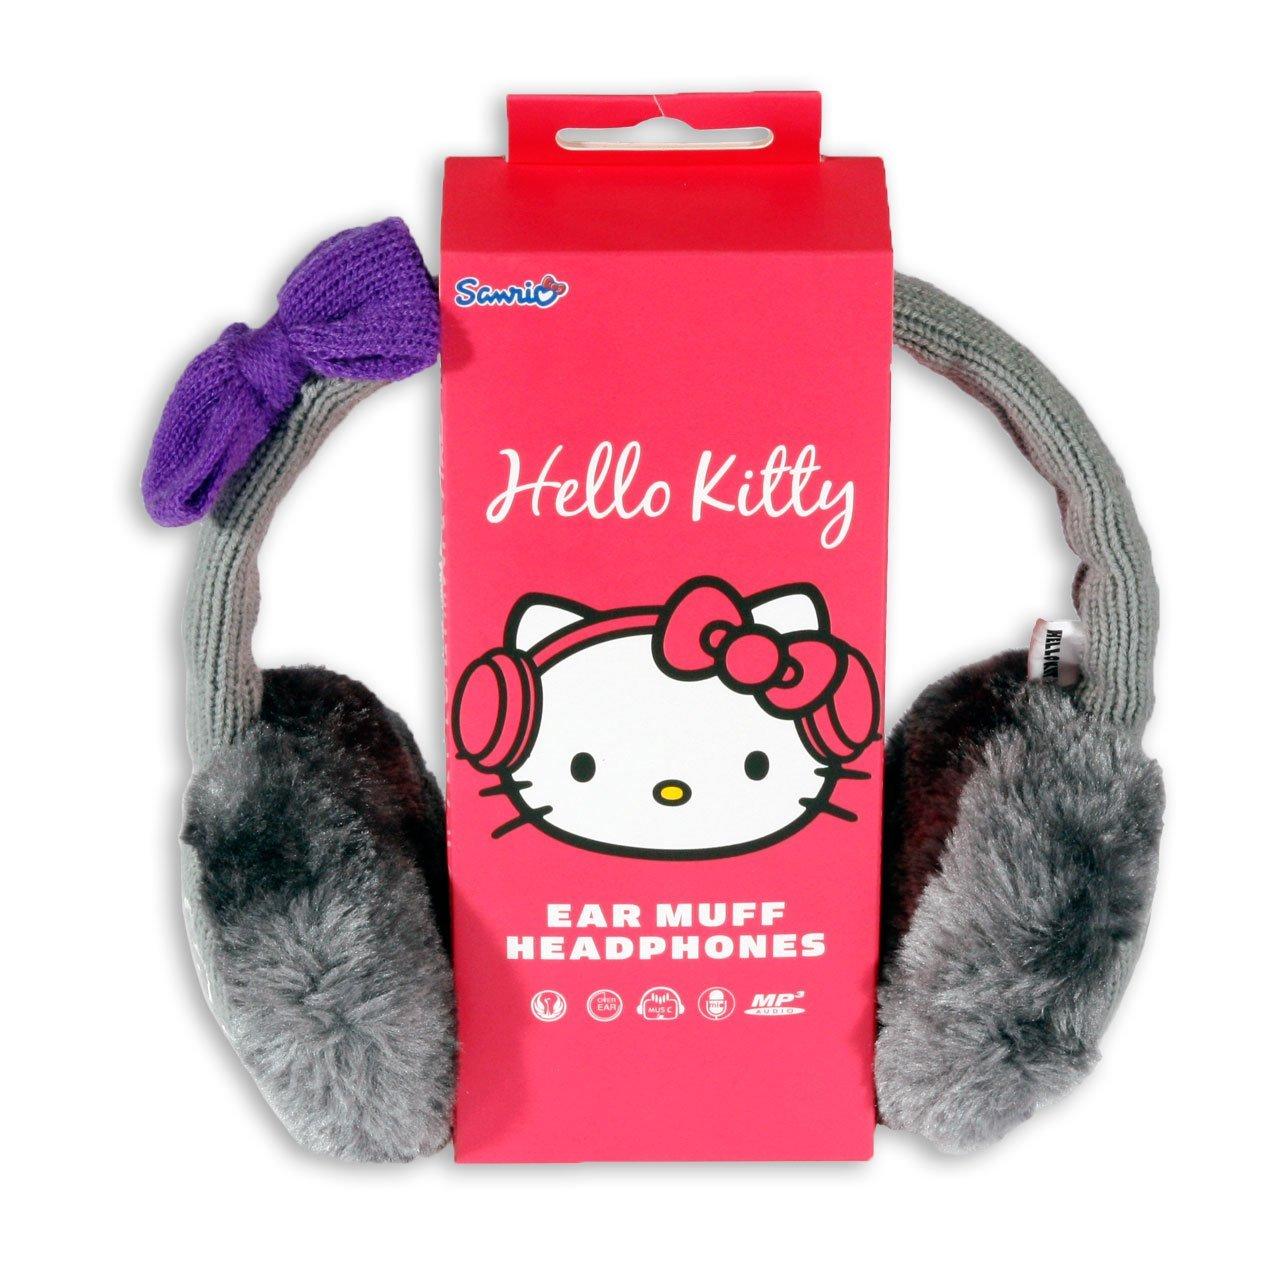 6 Best Hello Kitty Headphones for Kids